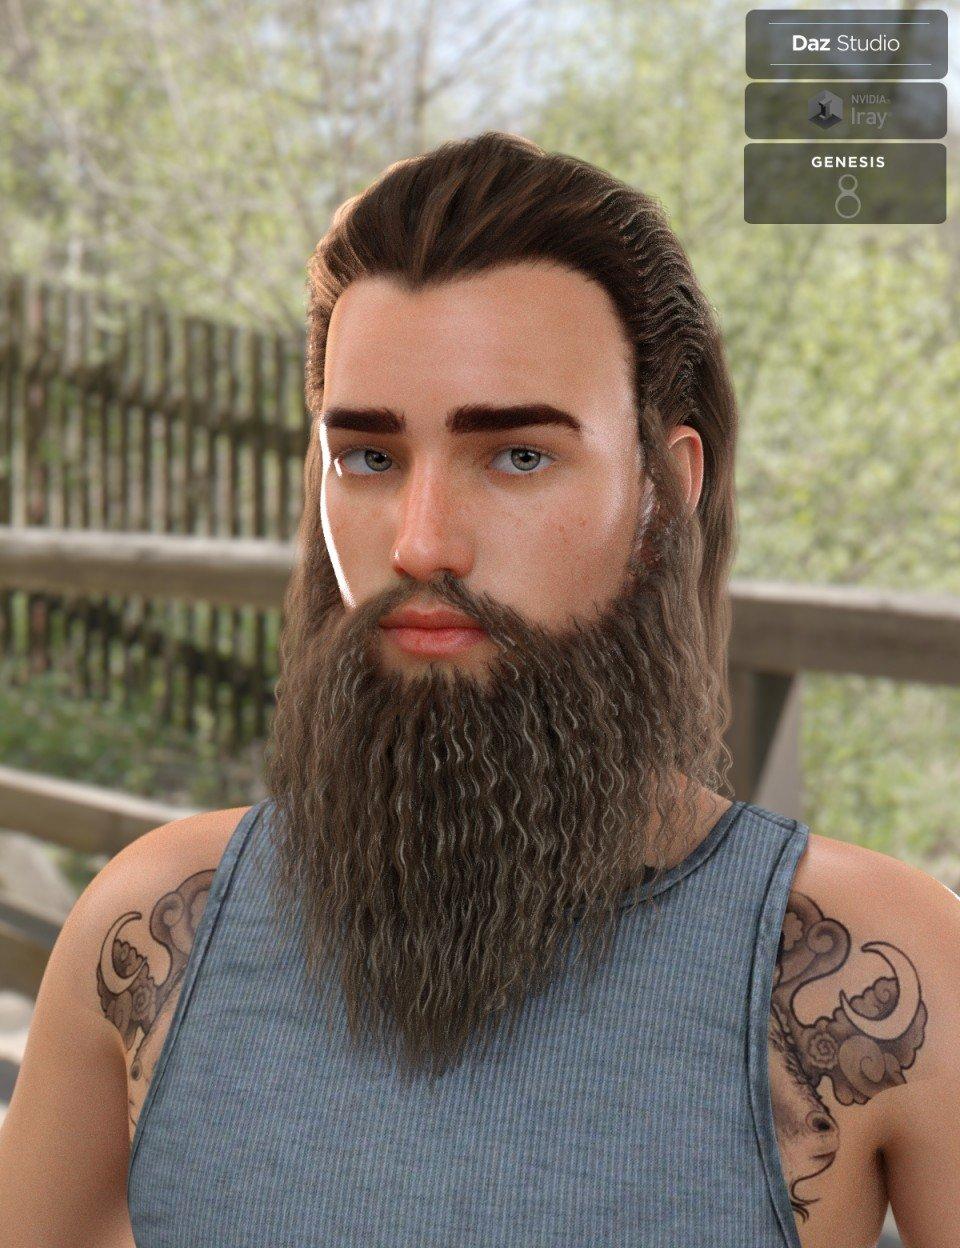 Ryanno Hair and Beard Set for Genesis 8 Male_DAZ3D下载站